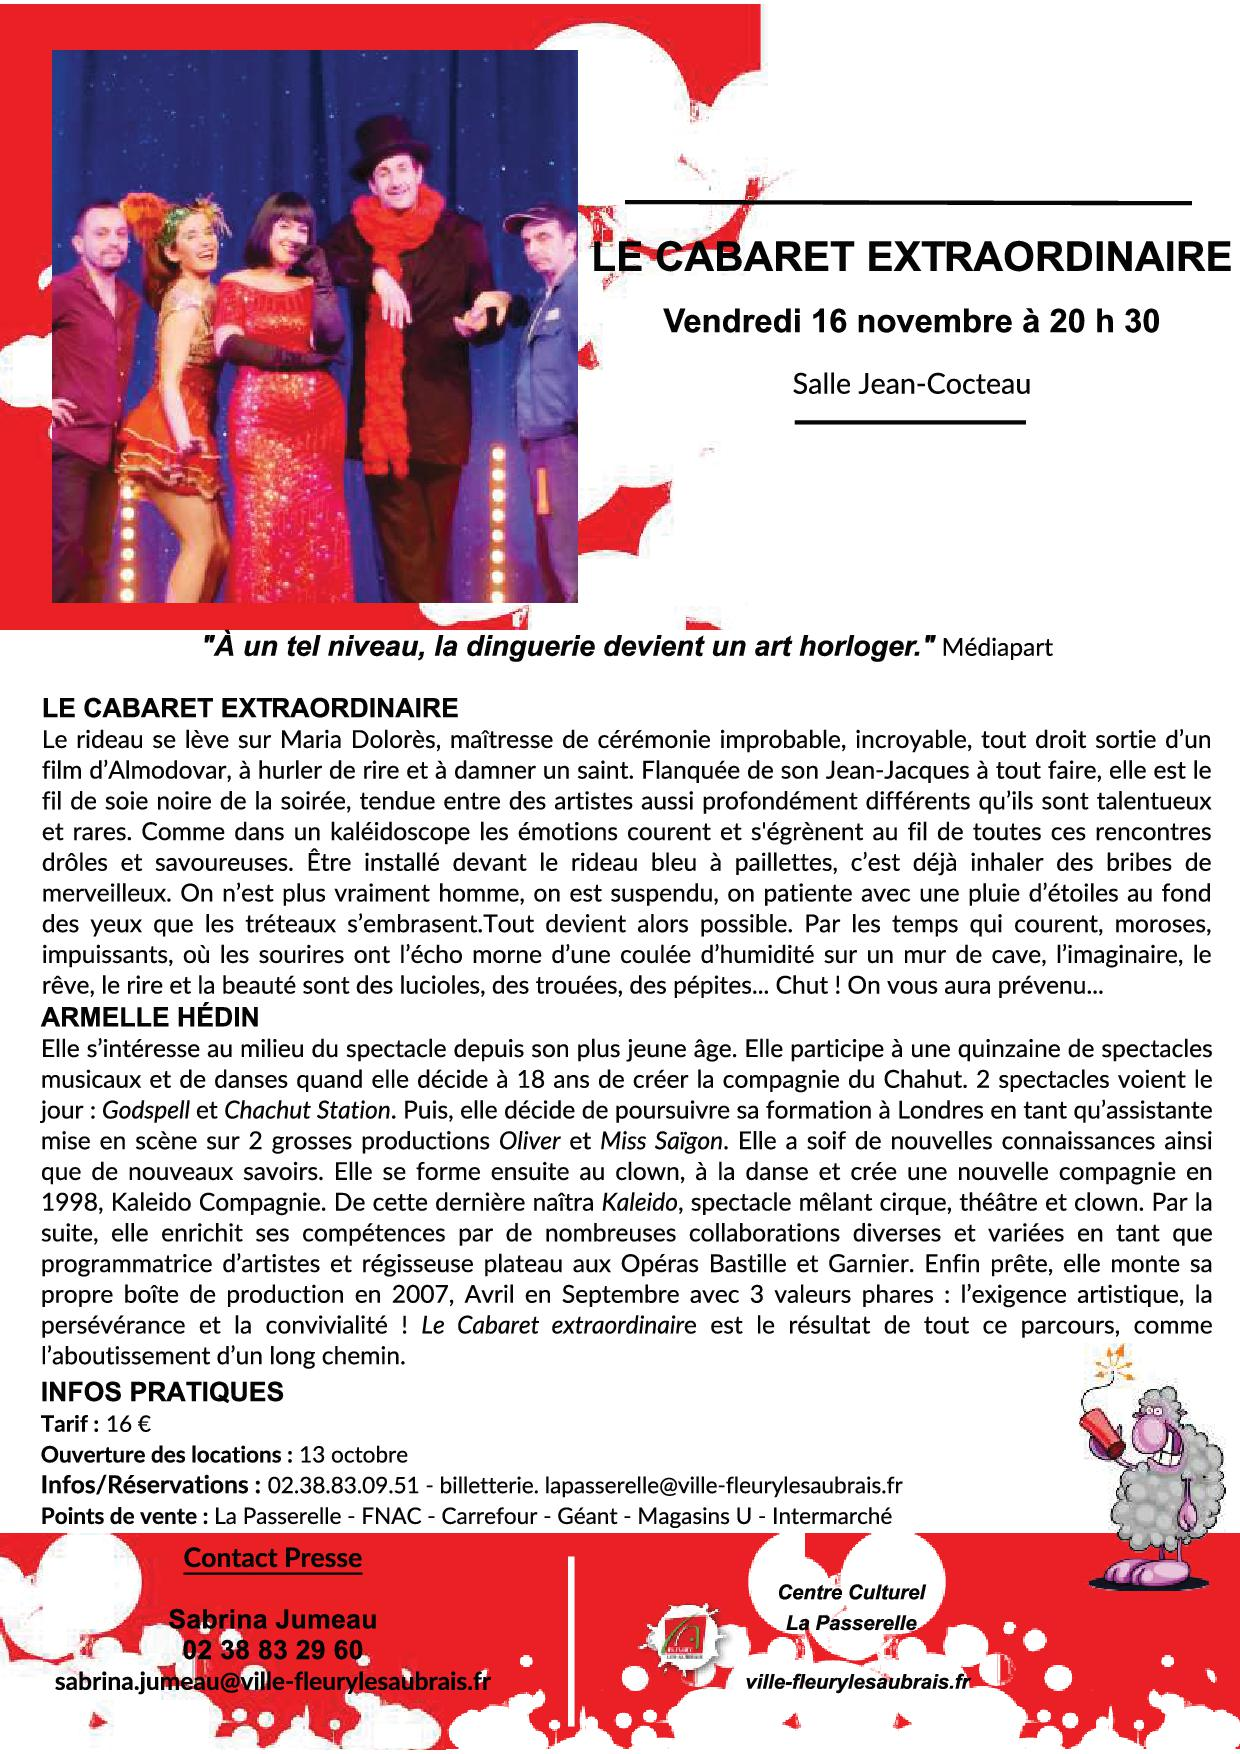 Le cabaret extraordinaire - 16 novembre.jpg